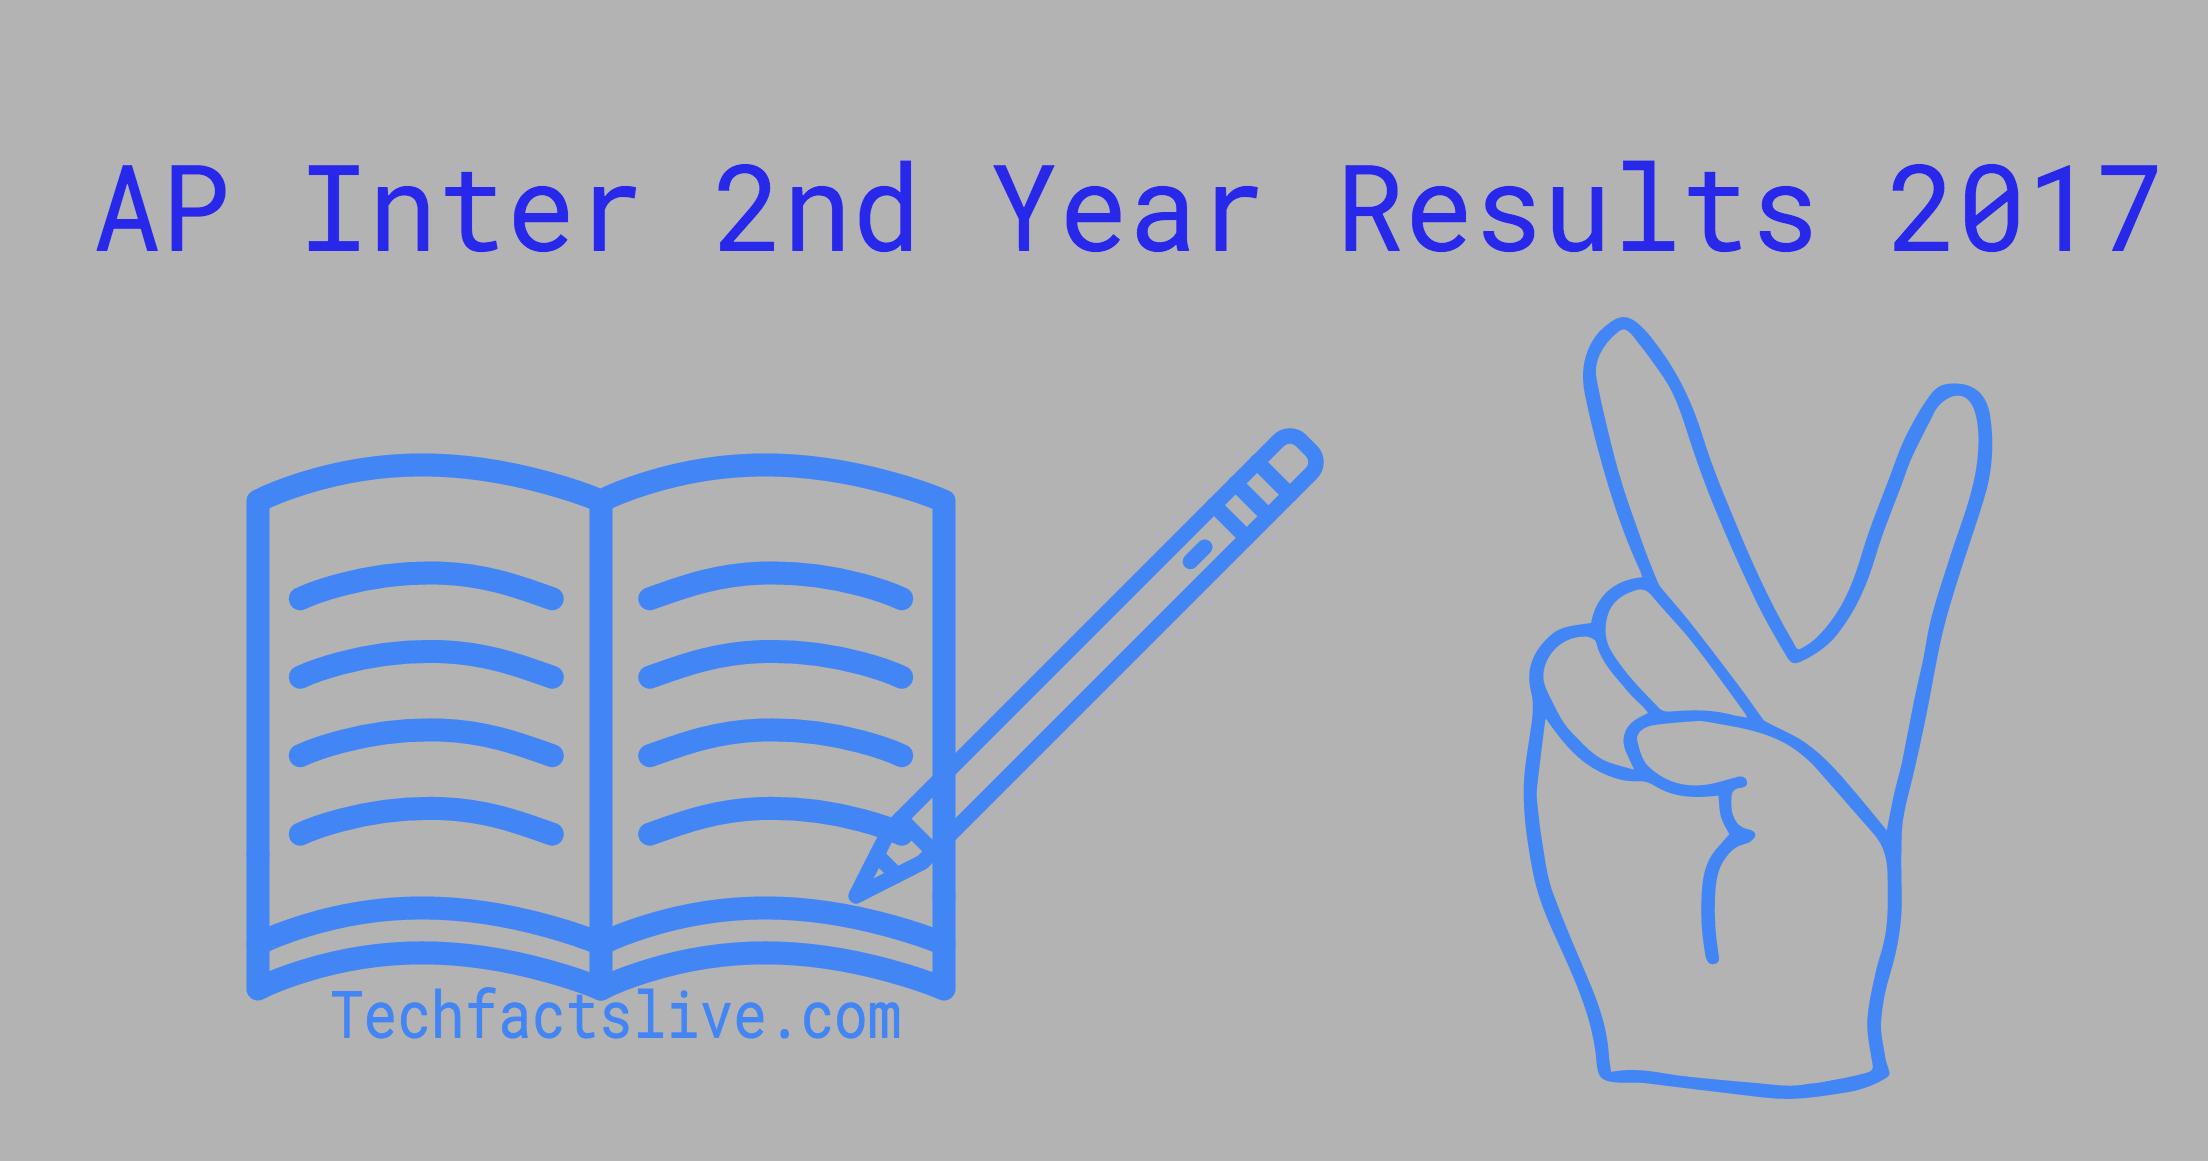 BIEAP AP Intermediate 2nd year Results 2017 Released Check